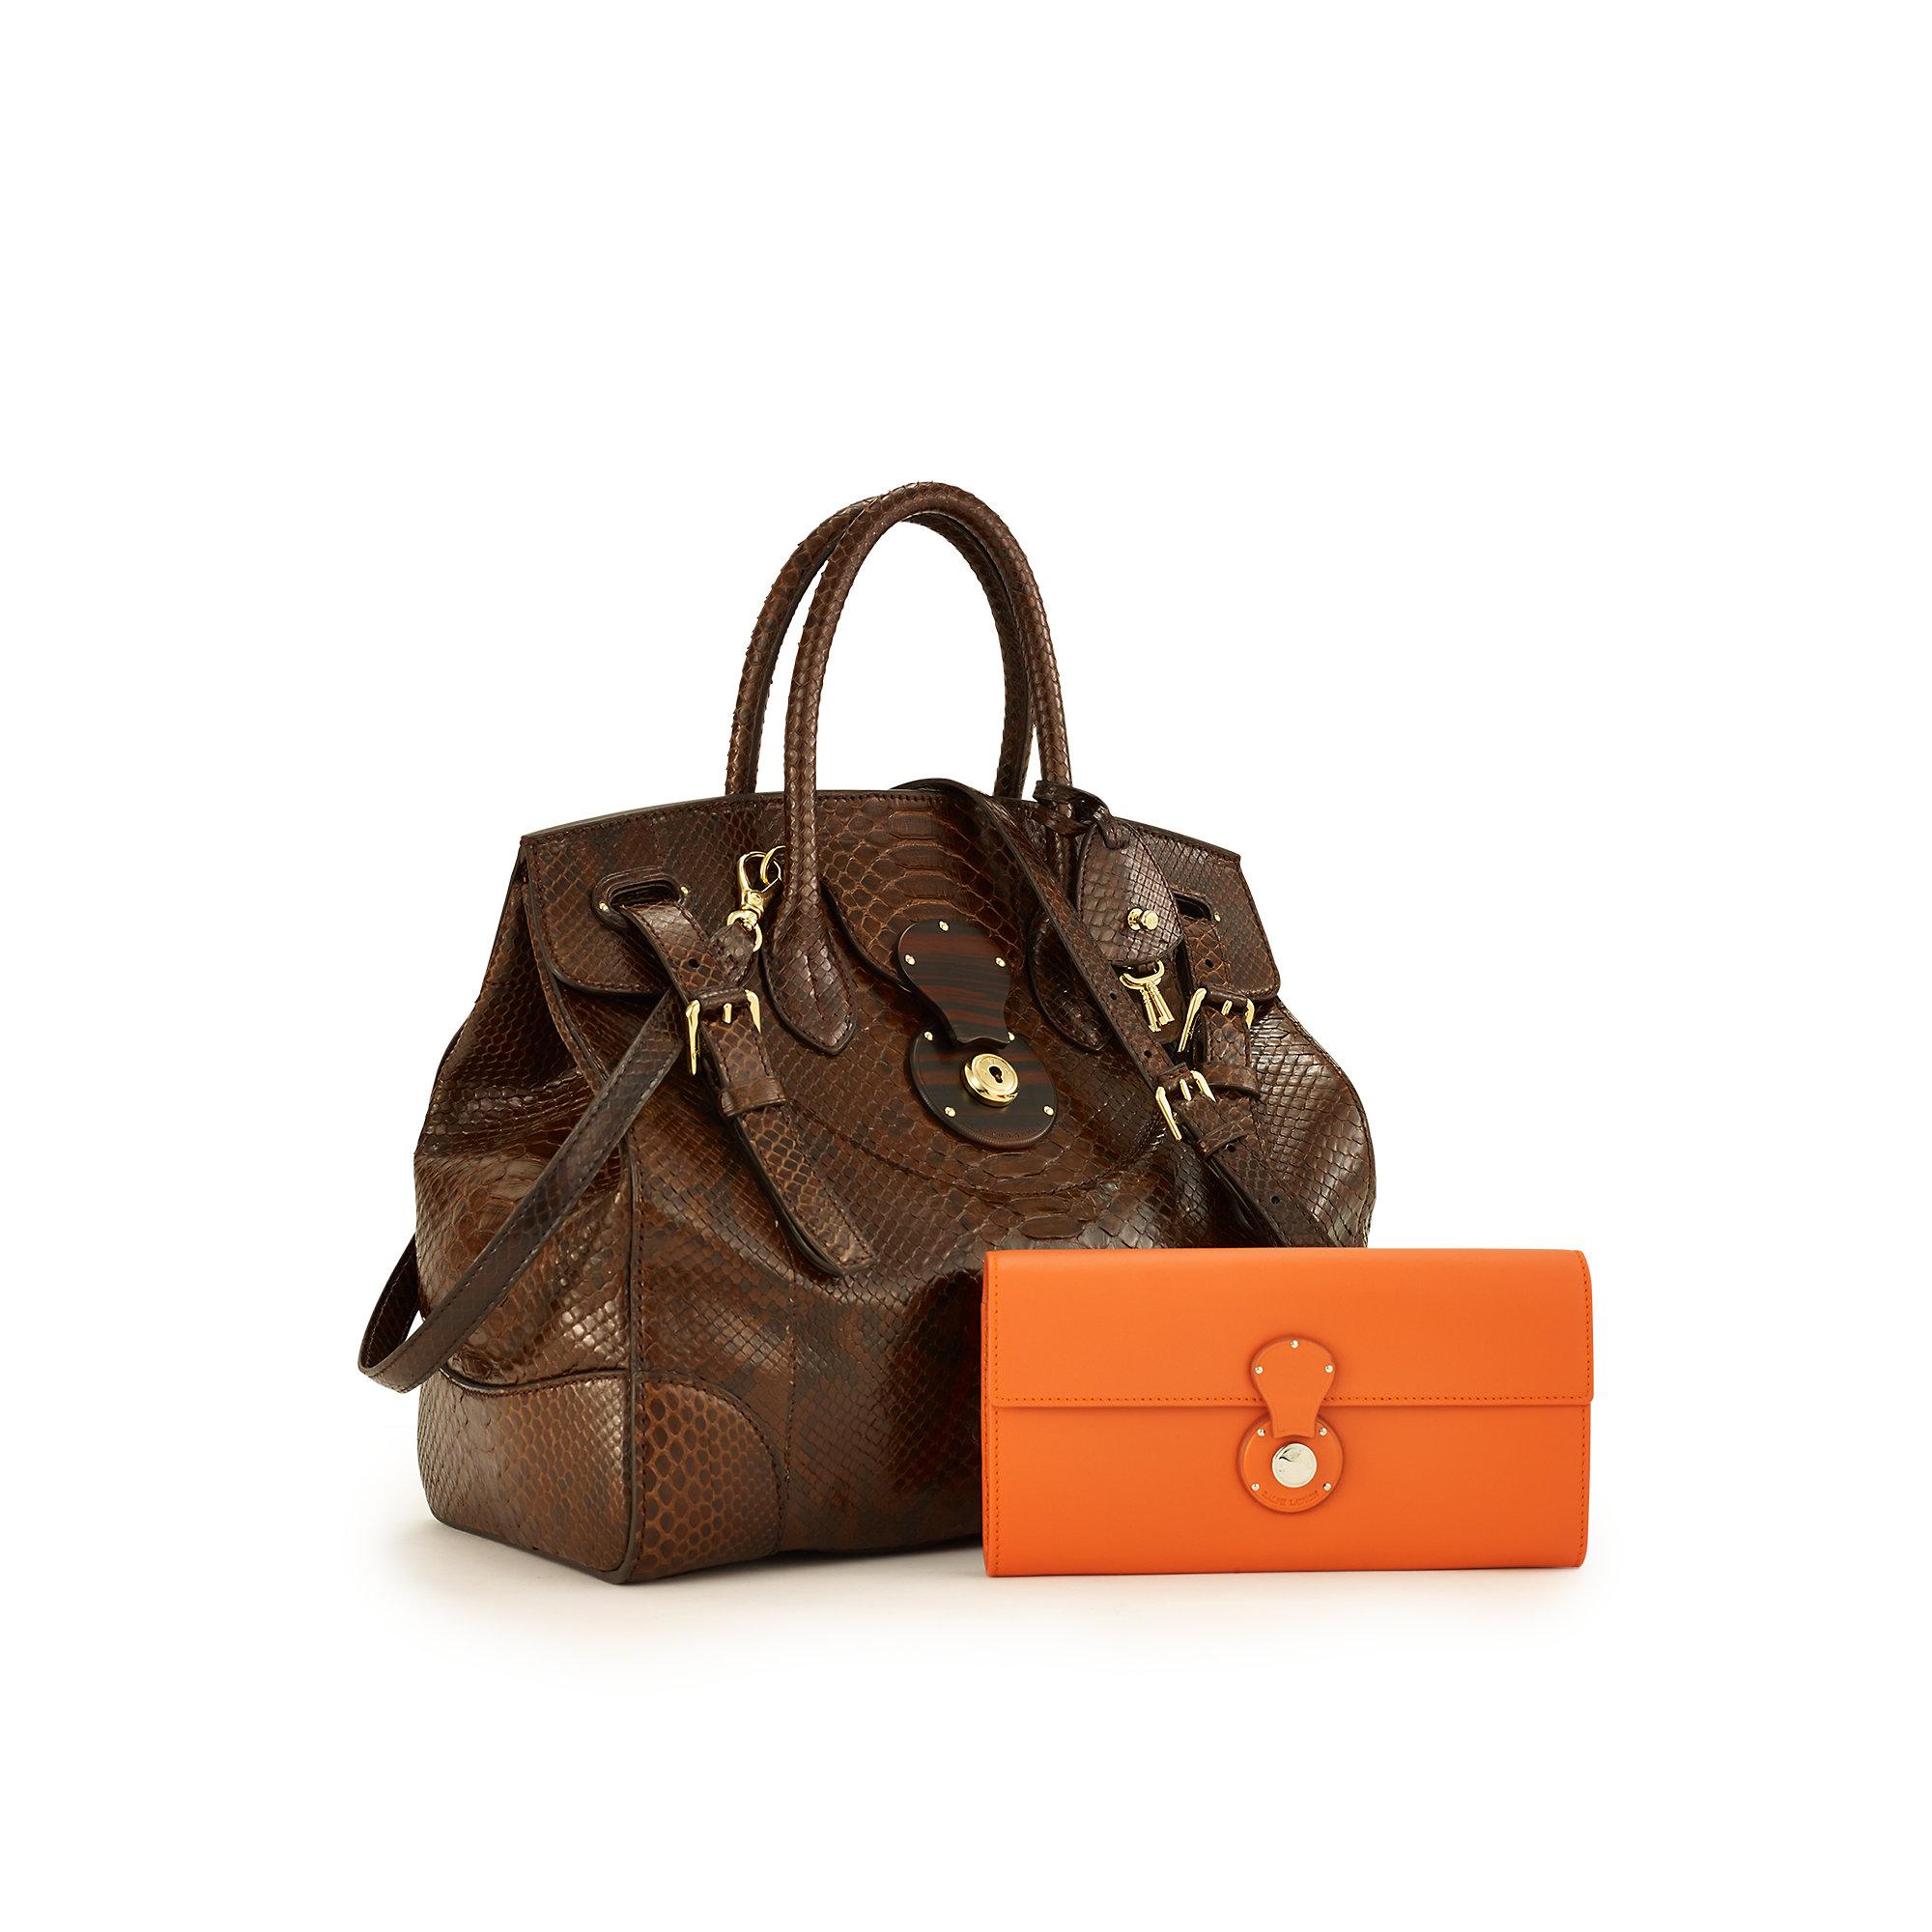 Lyst - Ralph Lauren Python Soft Ricky Bag in Brown f138137952